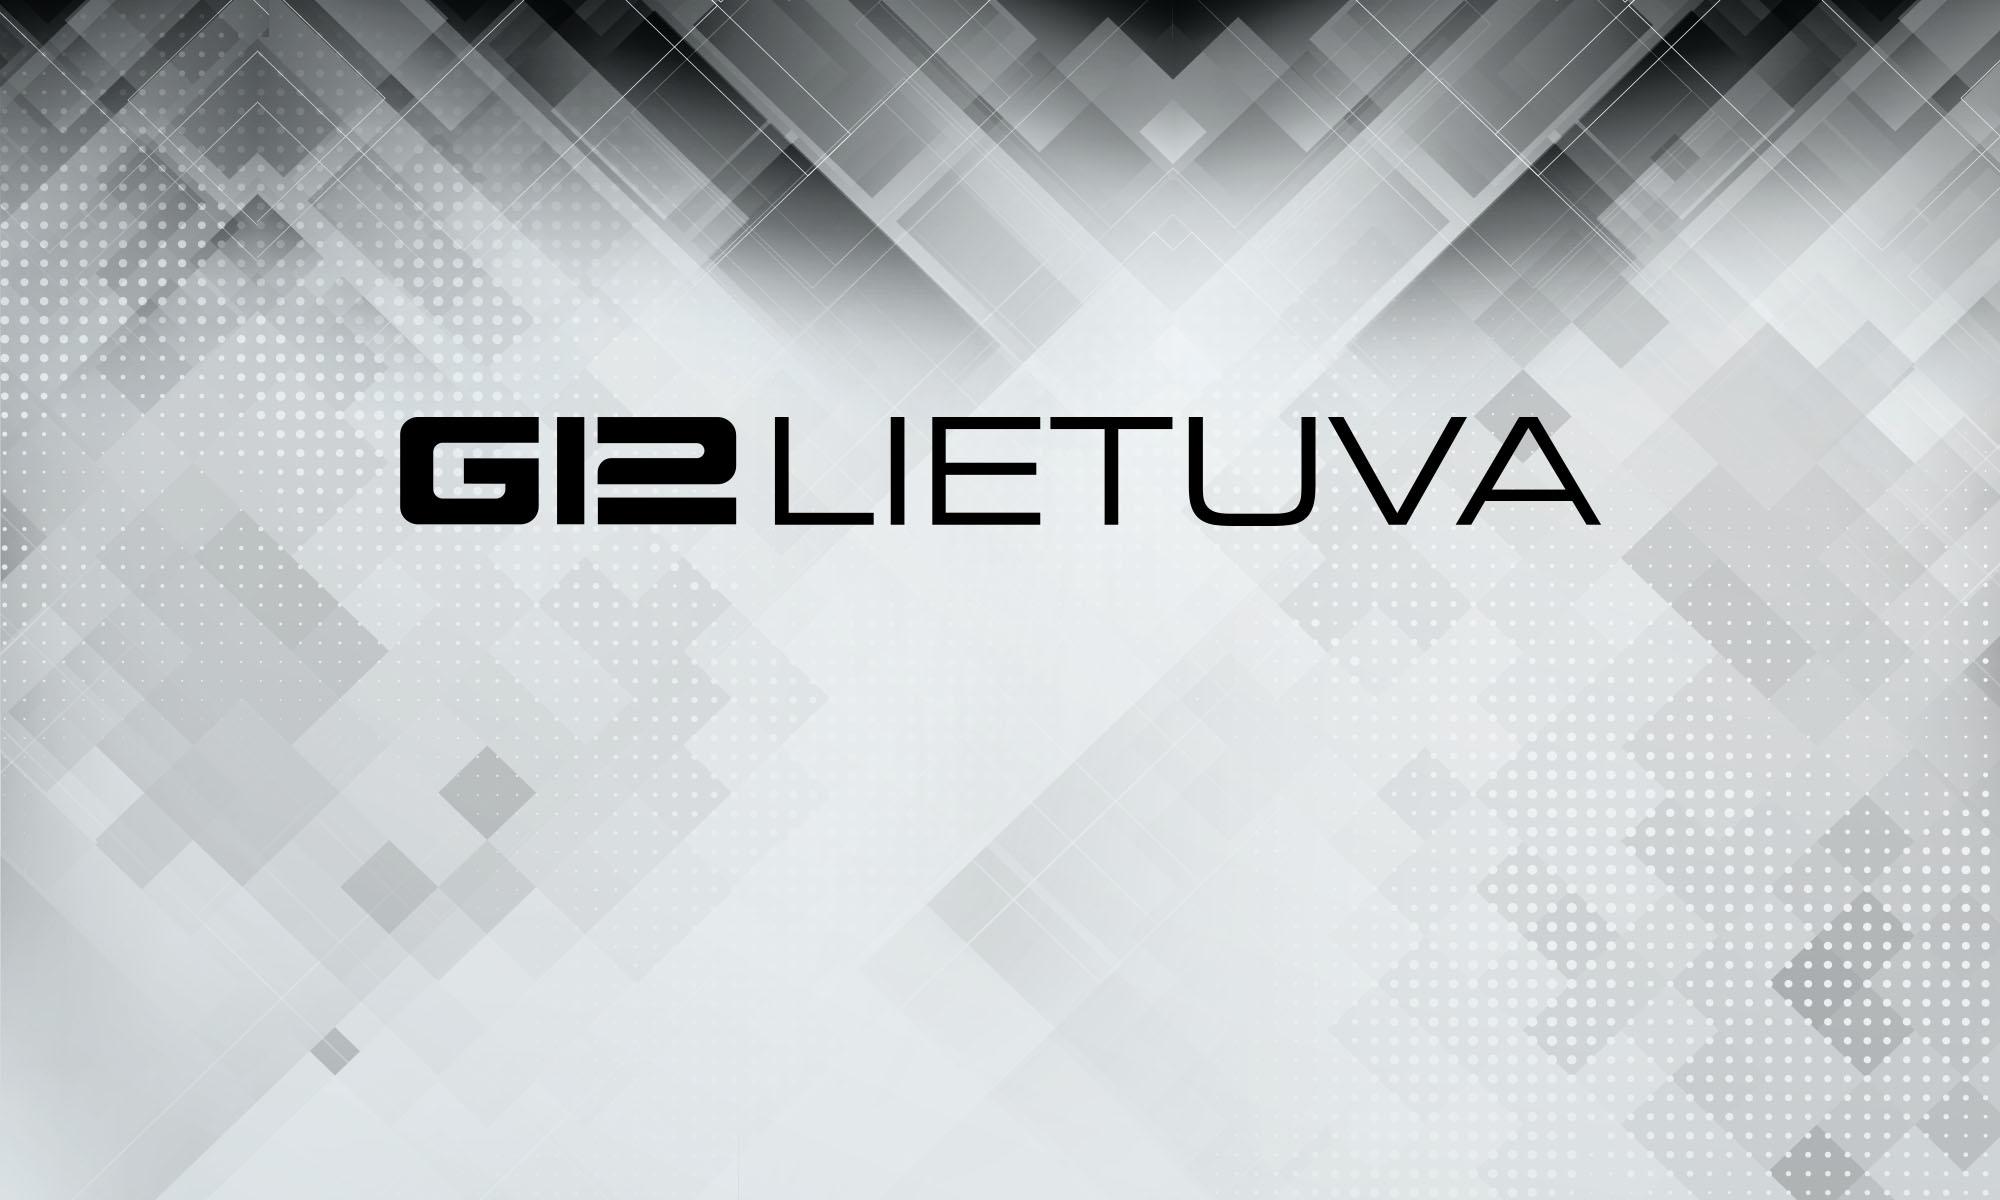 G12 Lietuva House of God / Podcasts